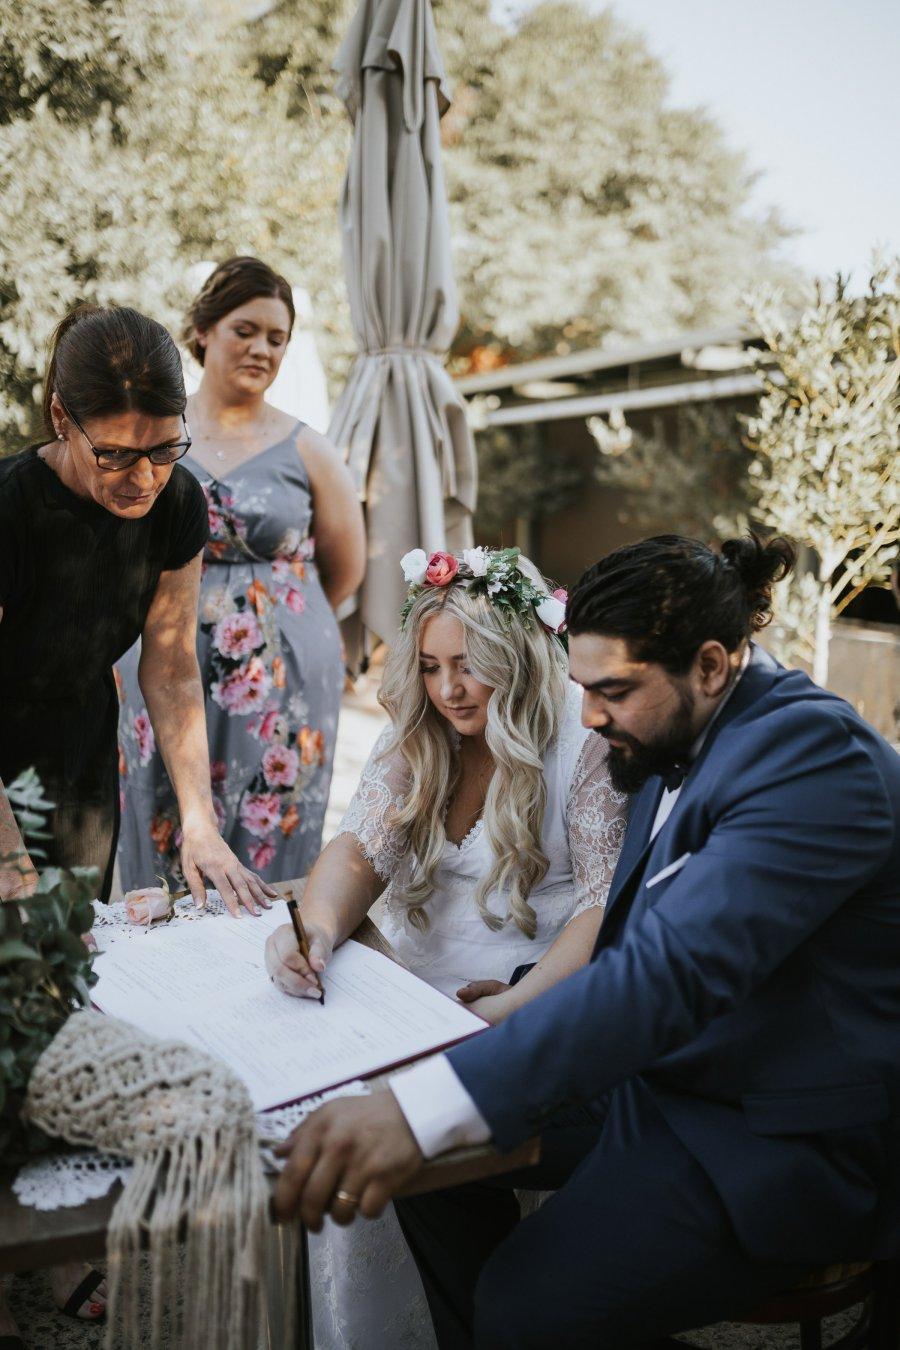 Ebony Blush Photography | Perth wedding Photographer | Perth City Farm Wedding | Imogen + Tristian69